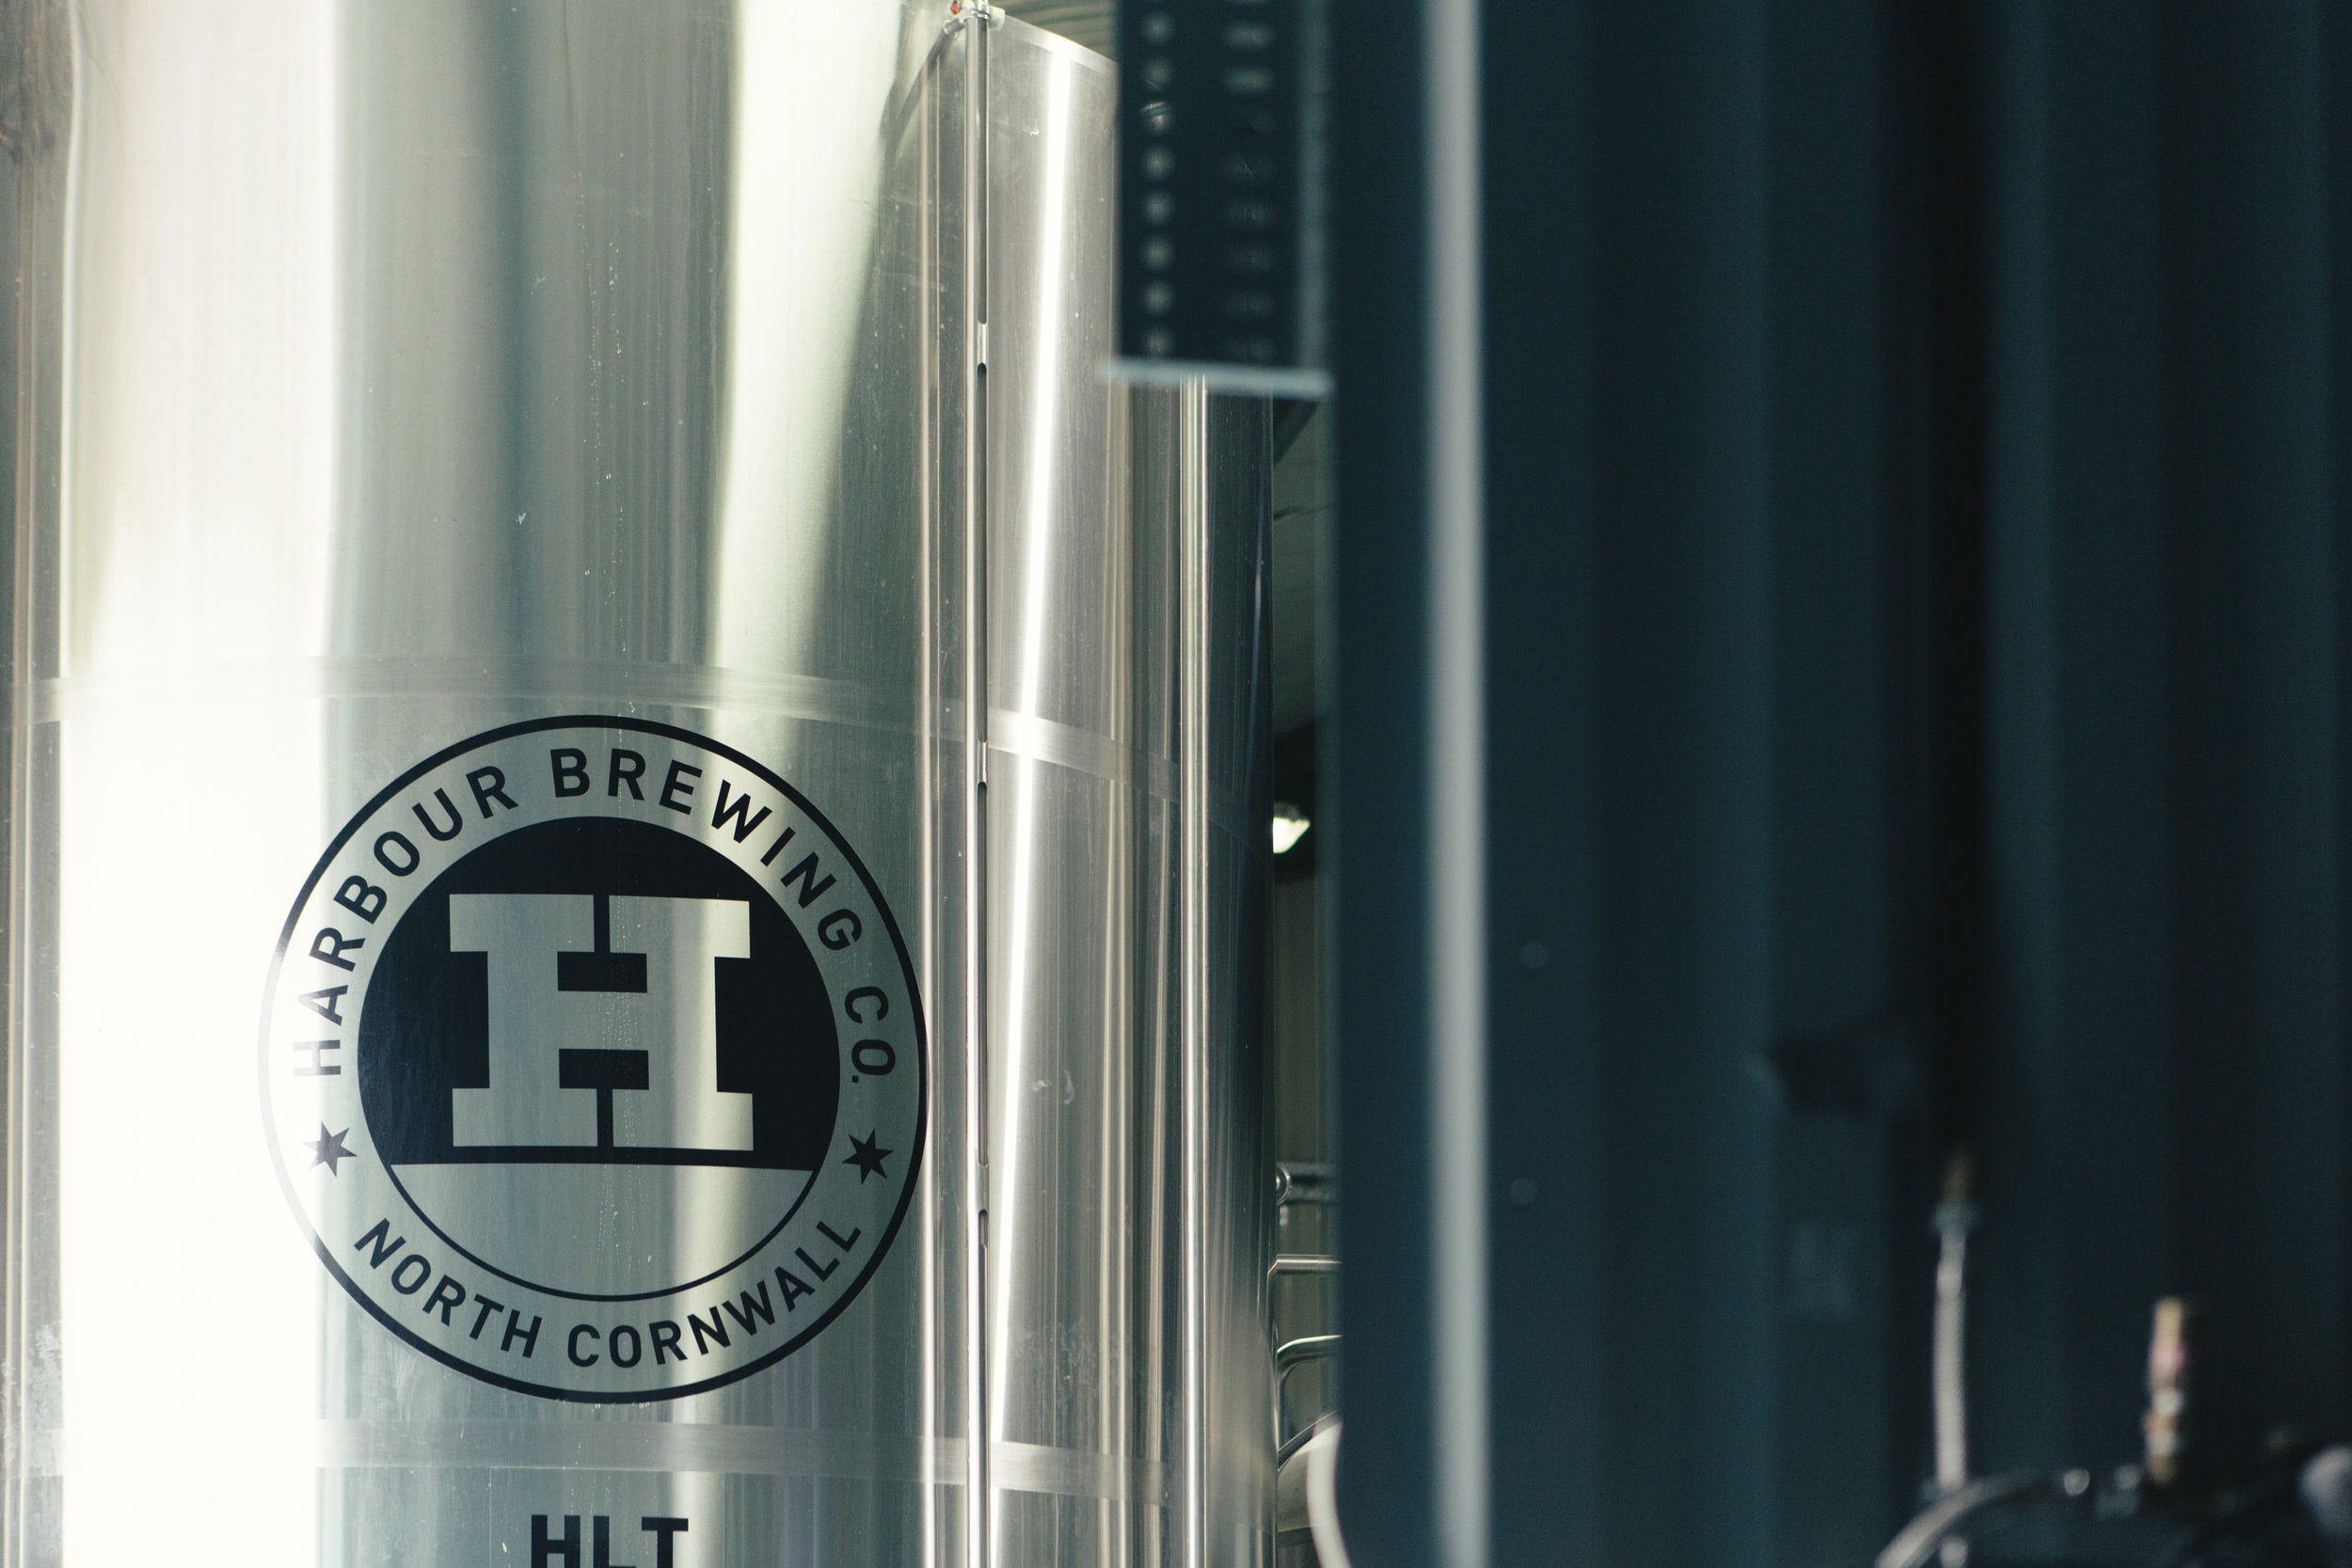 soul-arch-beer-harbour-brewery-aside-studio-design43.jpg